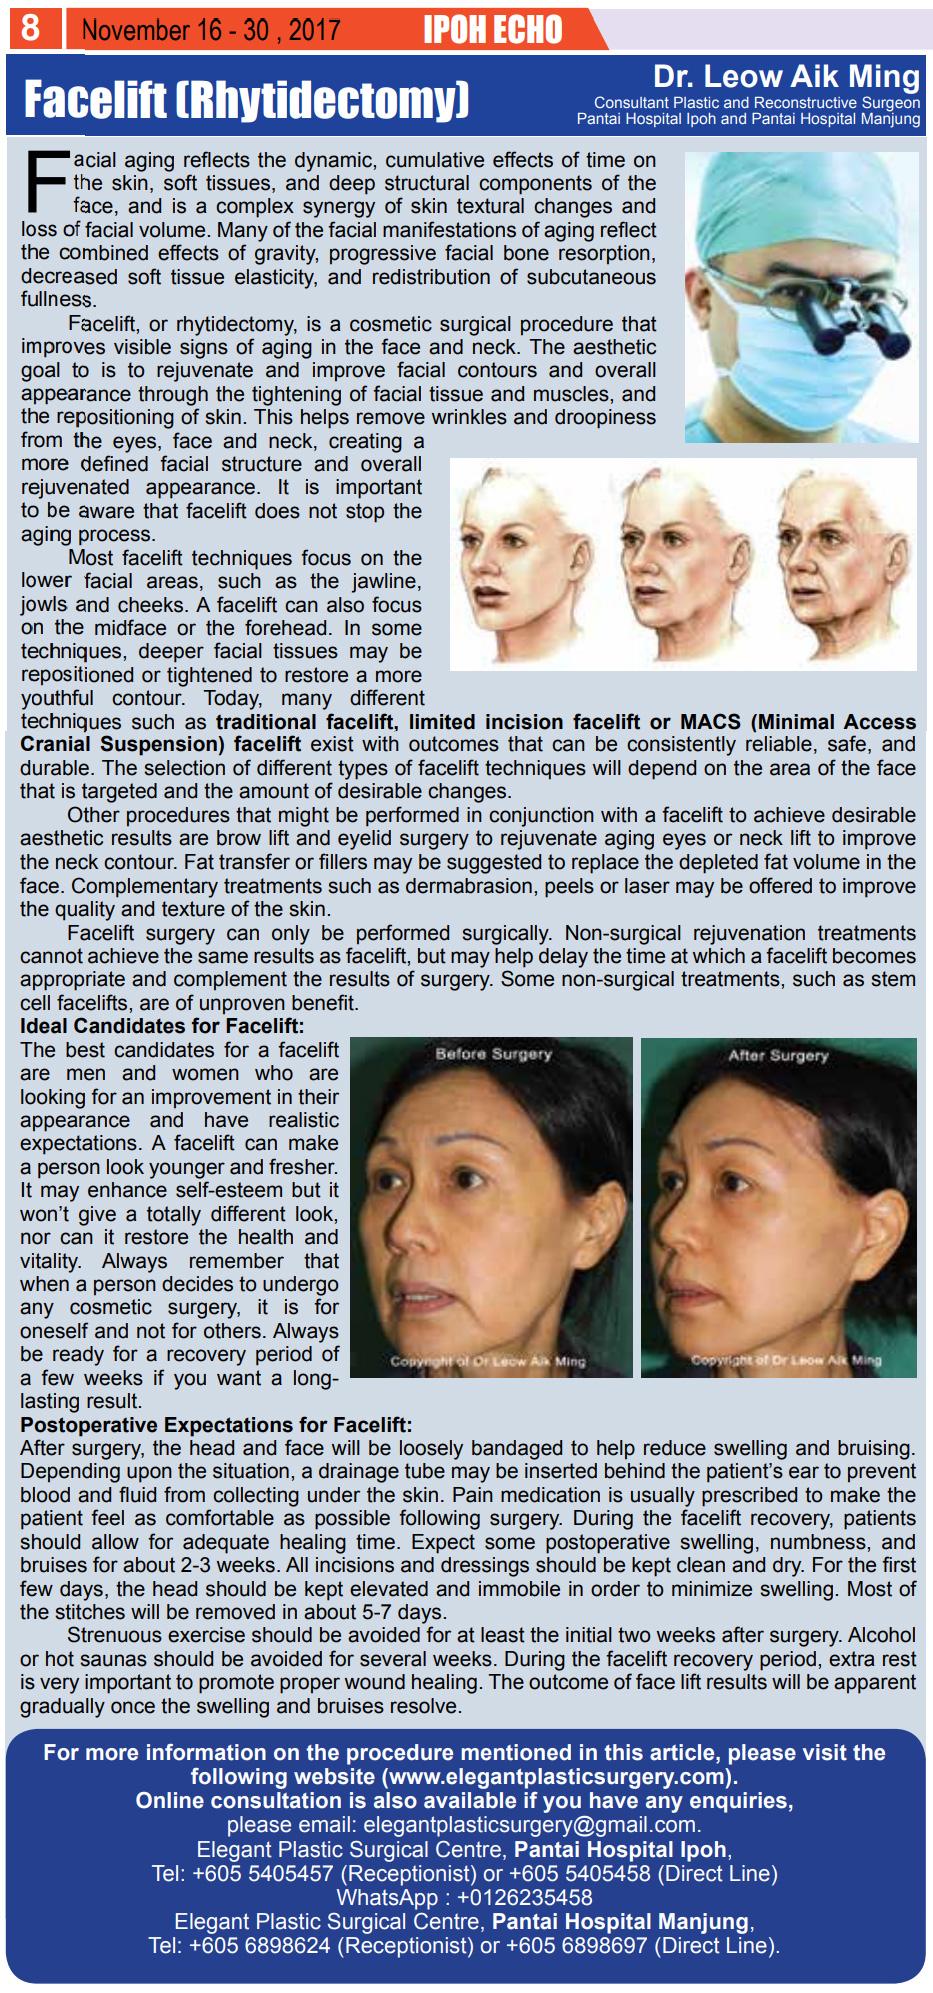 Facelift-(Rhytidectomy)